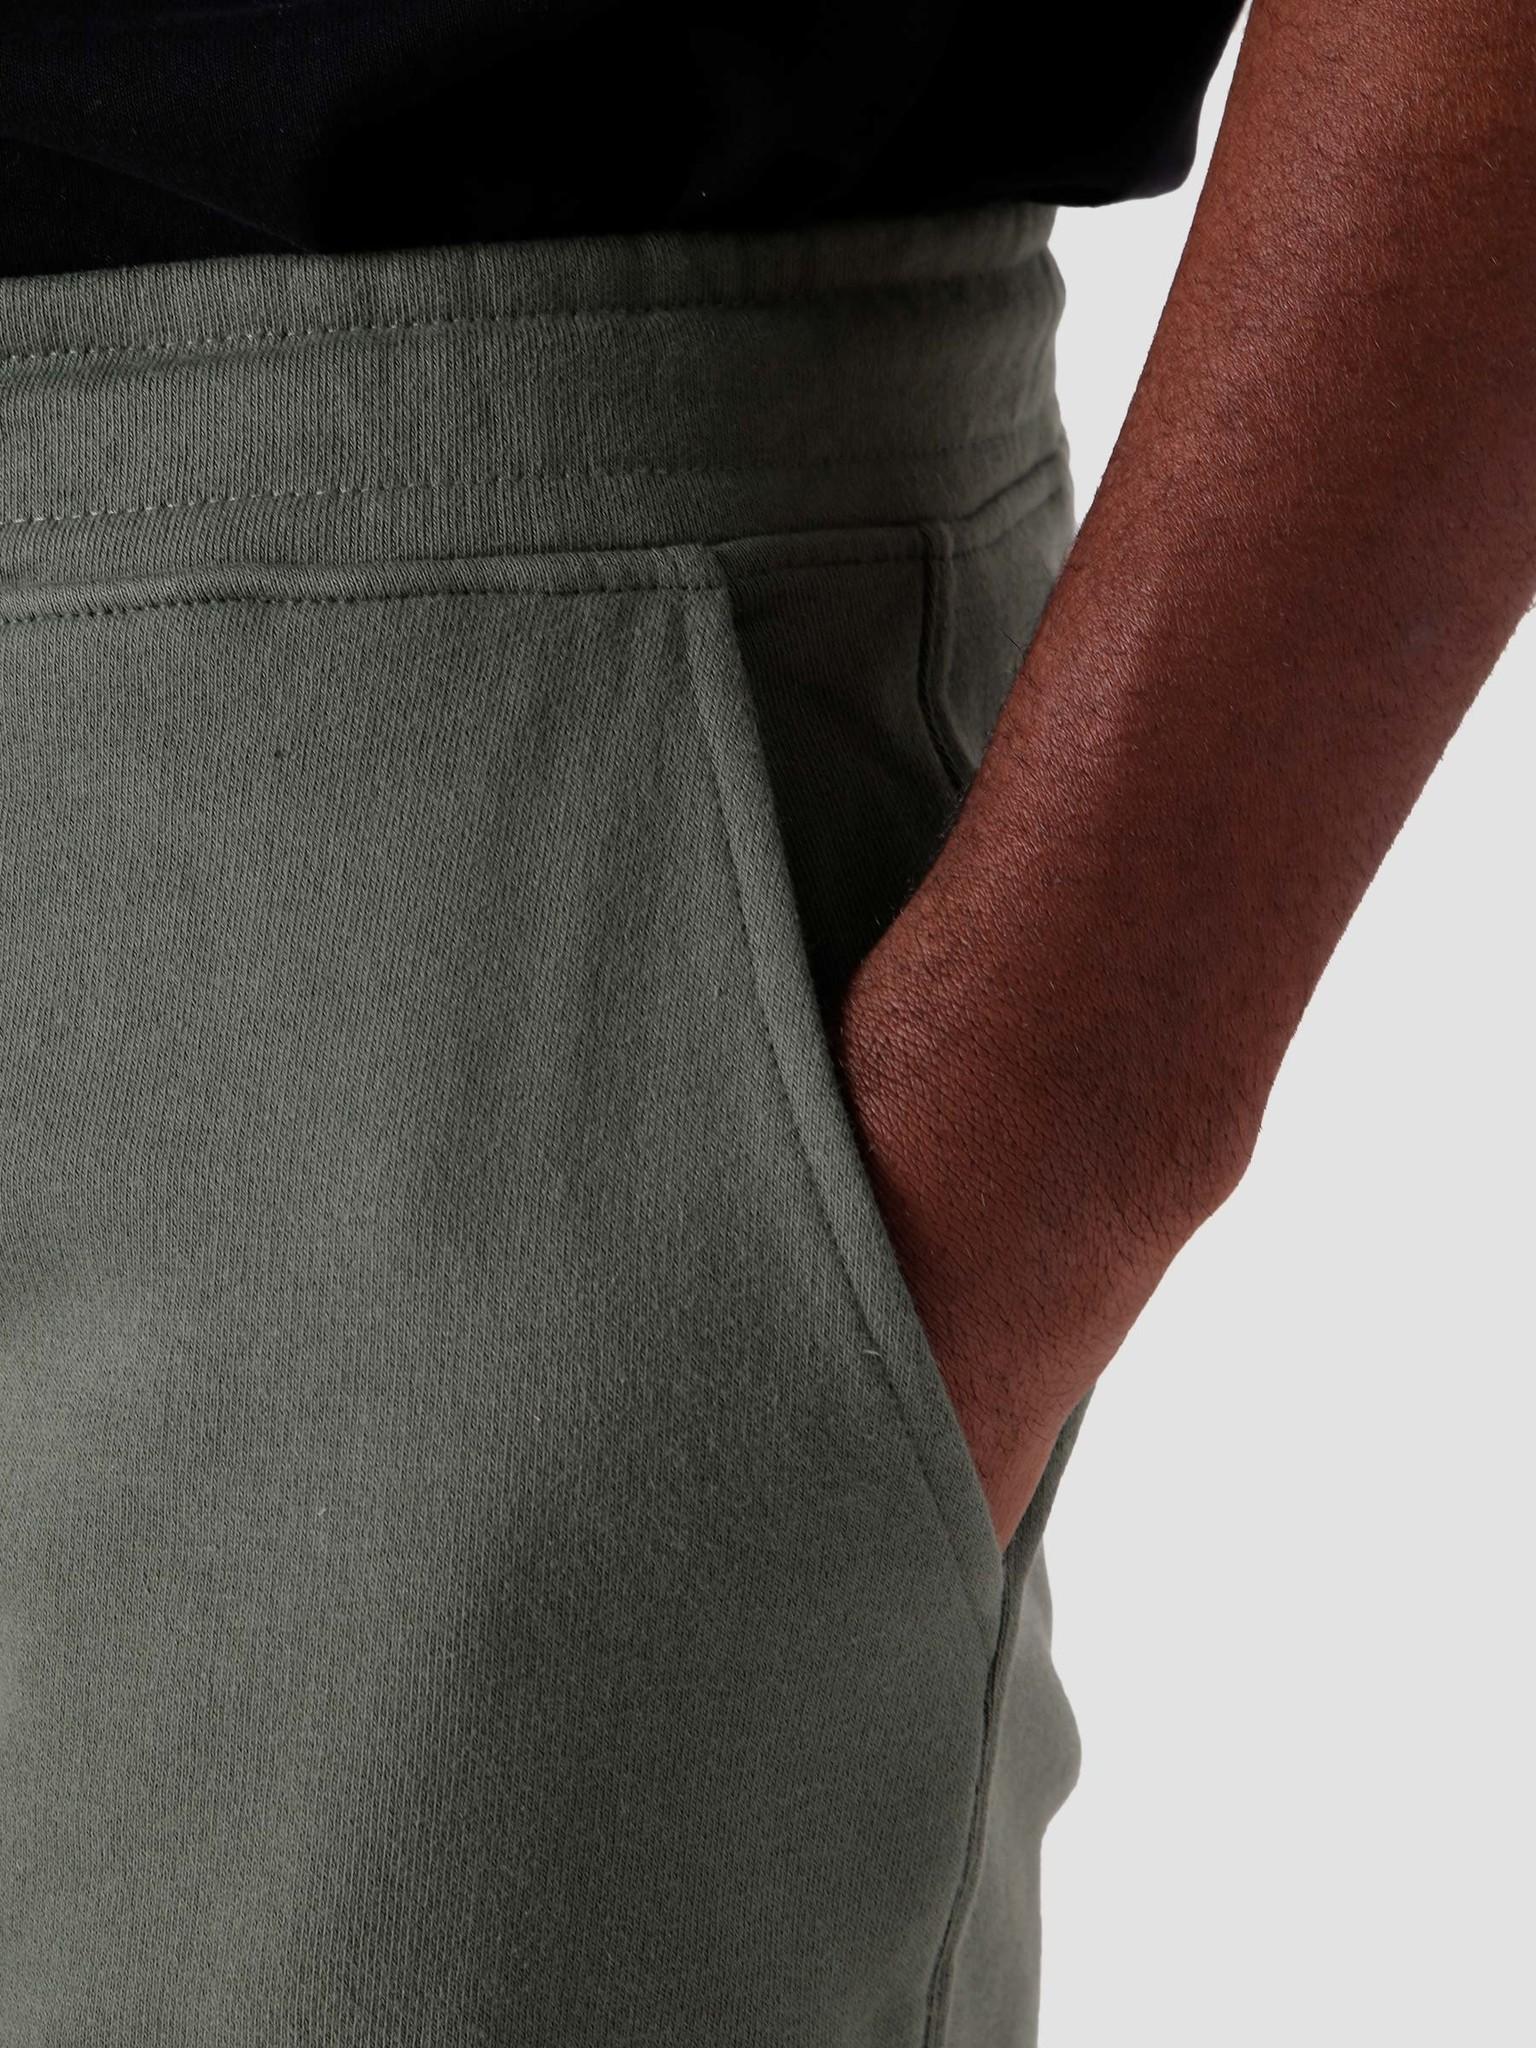 Quality Blanks Quality Blanks QB30 Sweat Short Light Olive